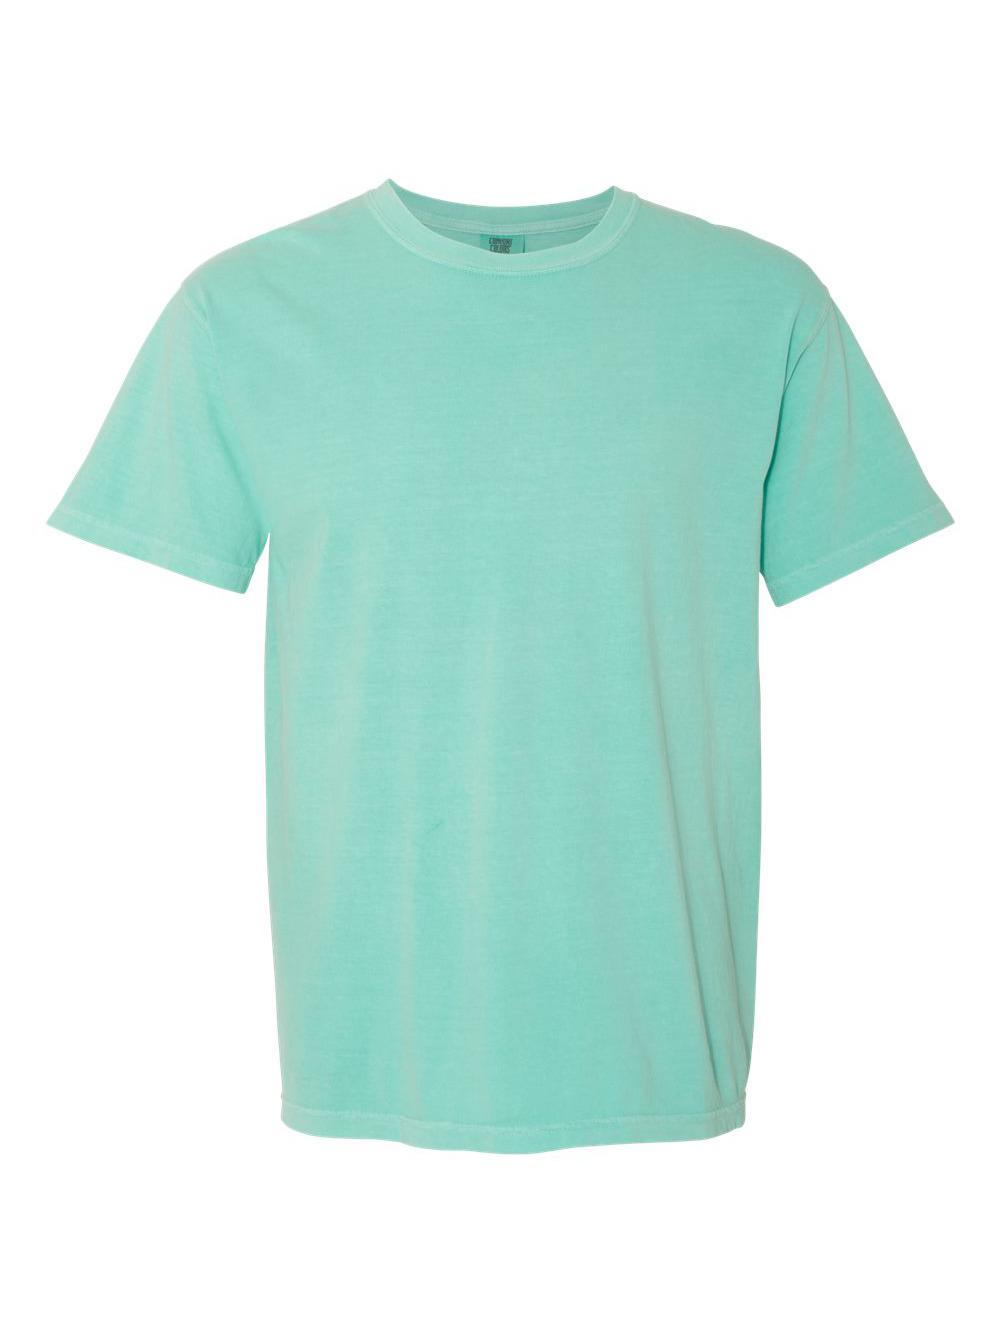 Comfort-Colors-Garment-Dyed-Heavyweight-Ringspun-Short-Sleeve-Shirt-1717 thumbnail 30